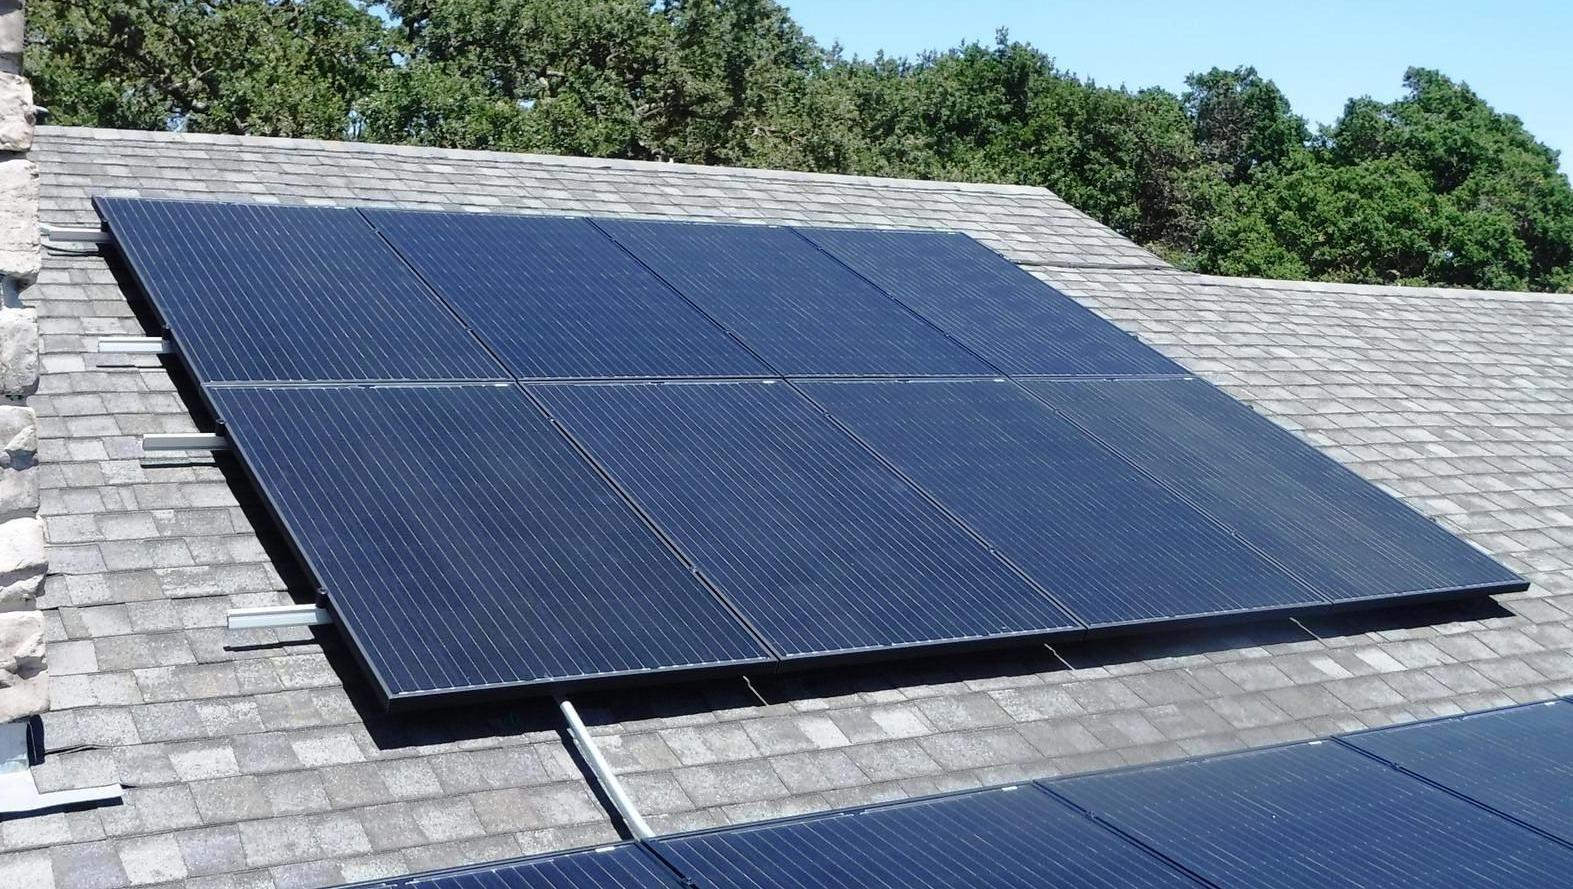 Silfab Solar, 290w Monocrystalline Solar Panel, 1000VDC, GZX